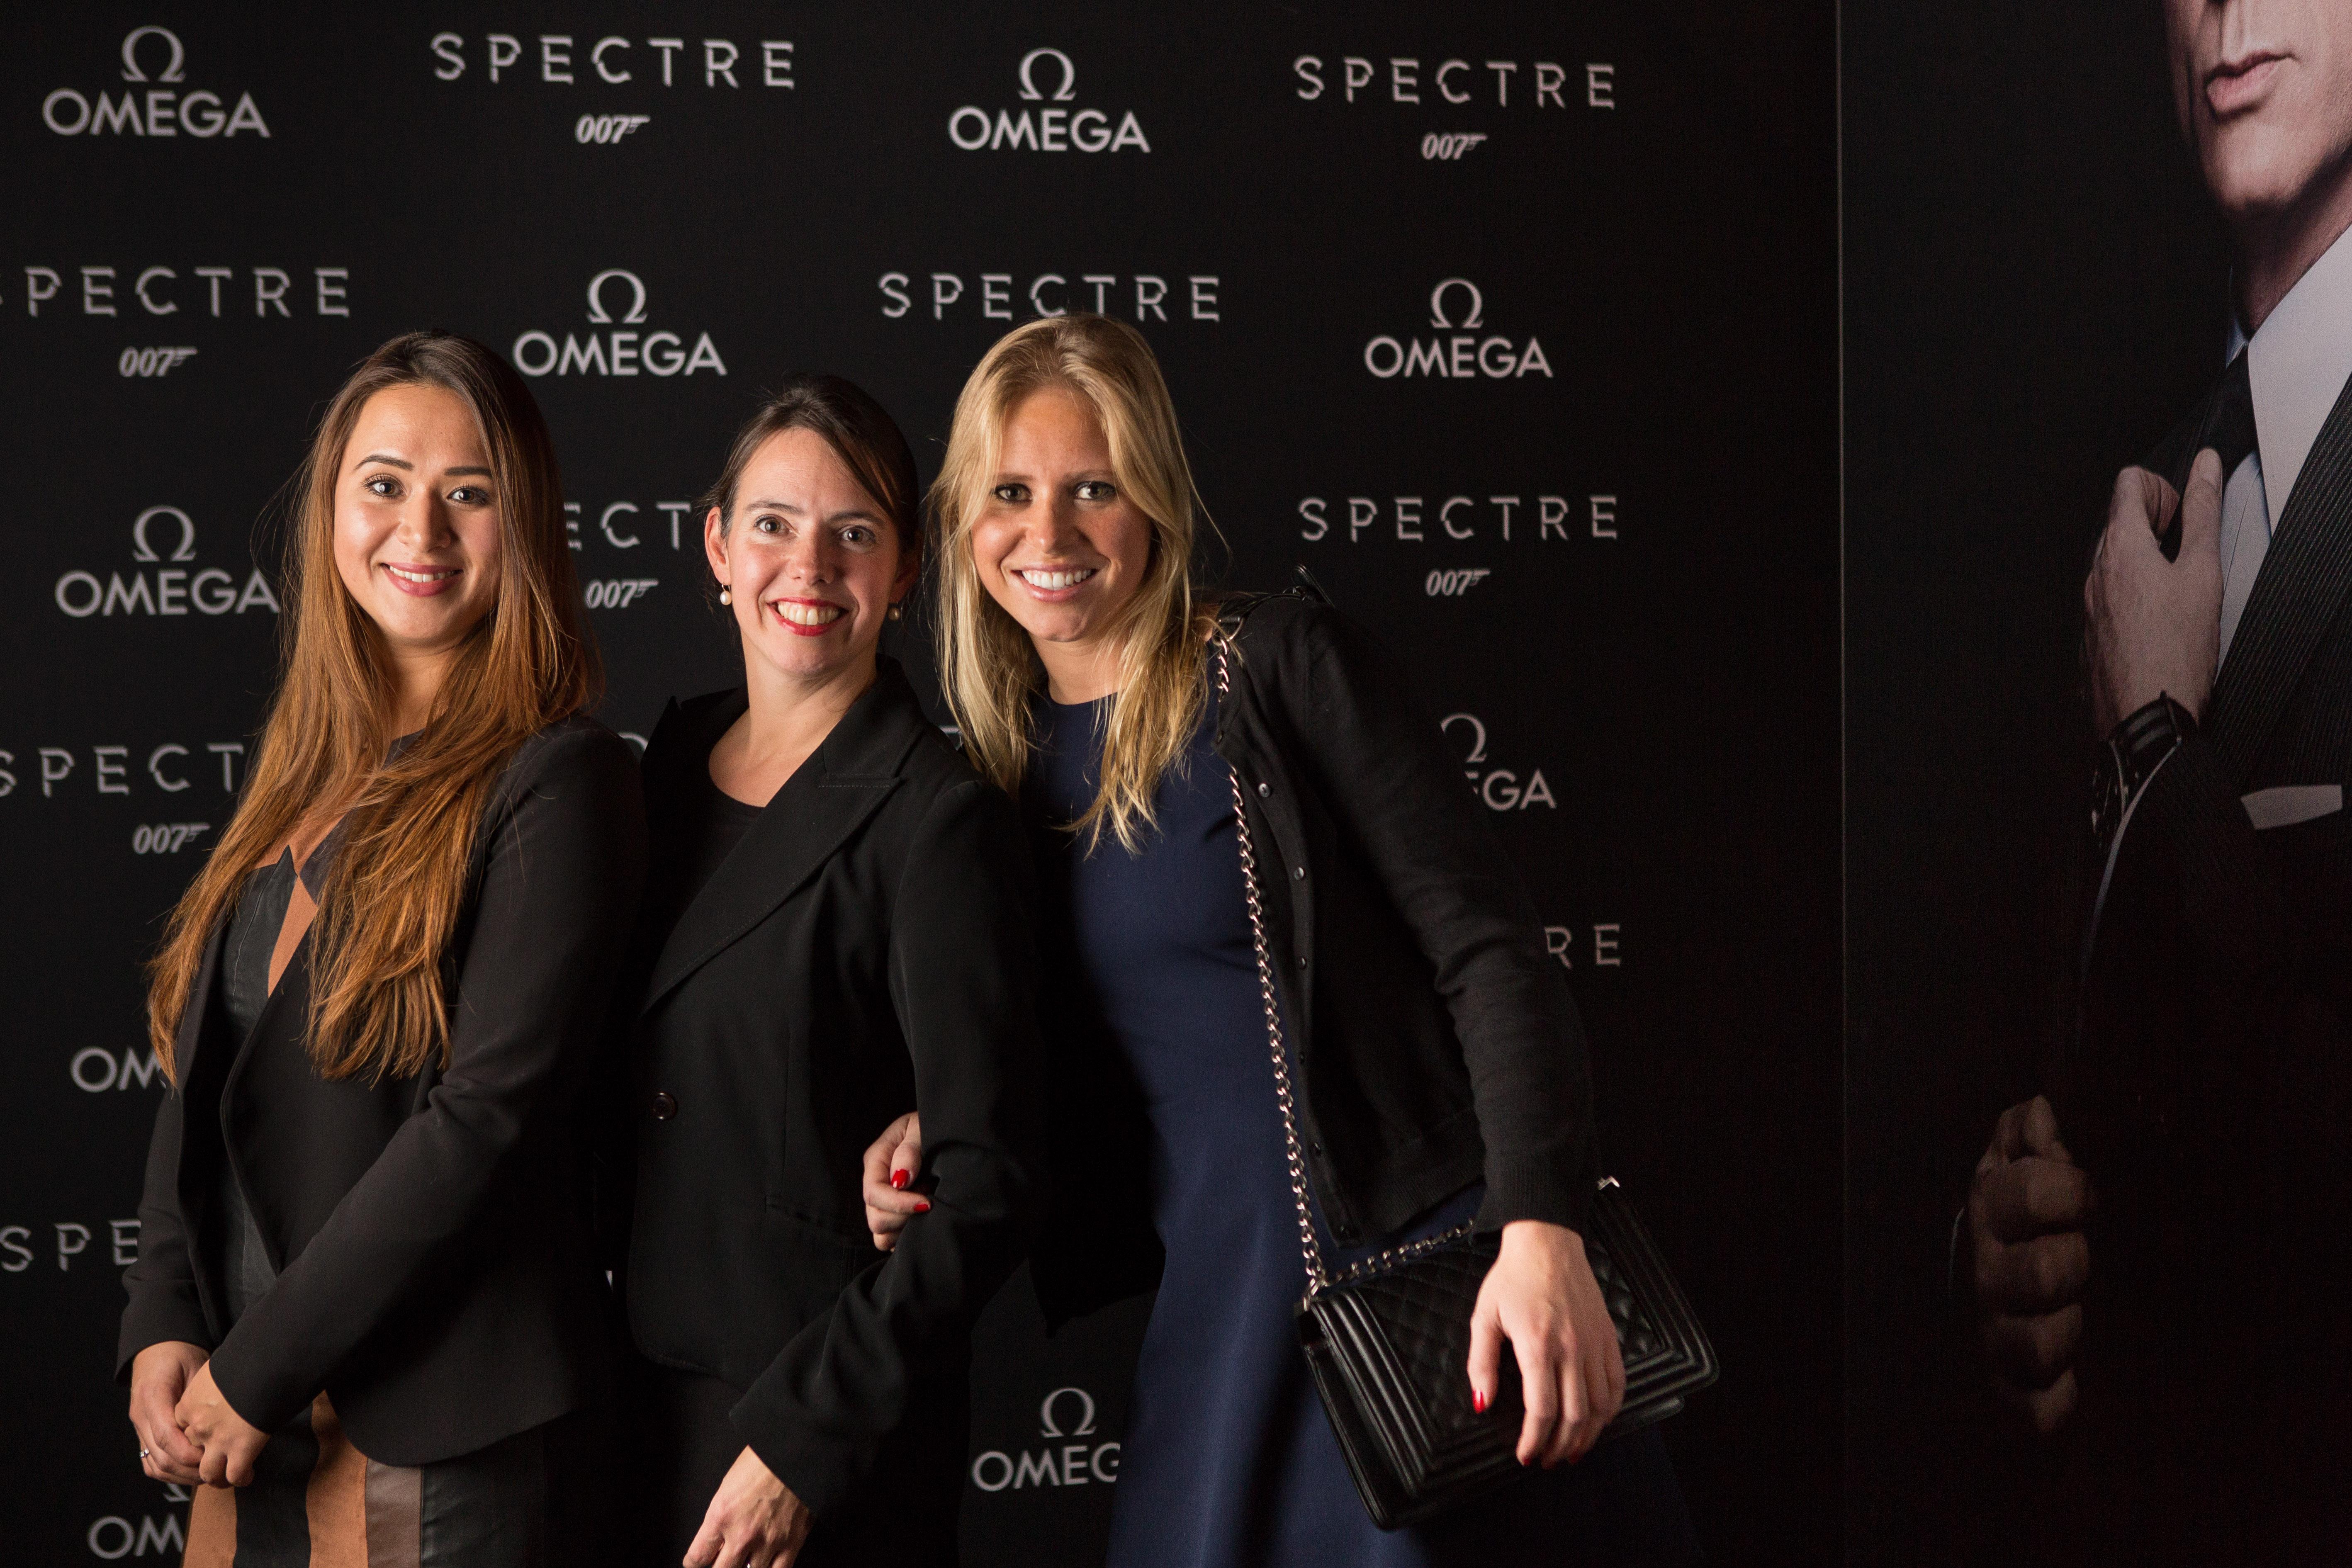 spectre-omega wall-58